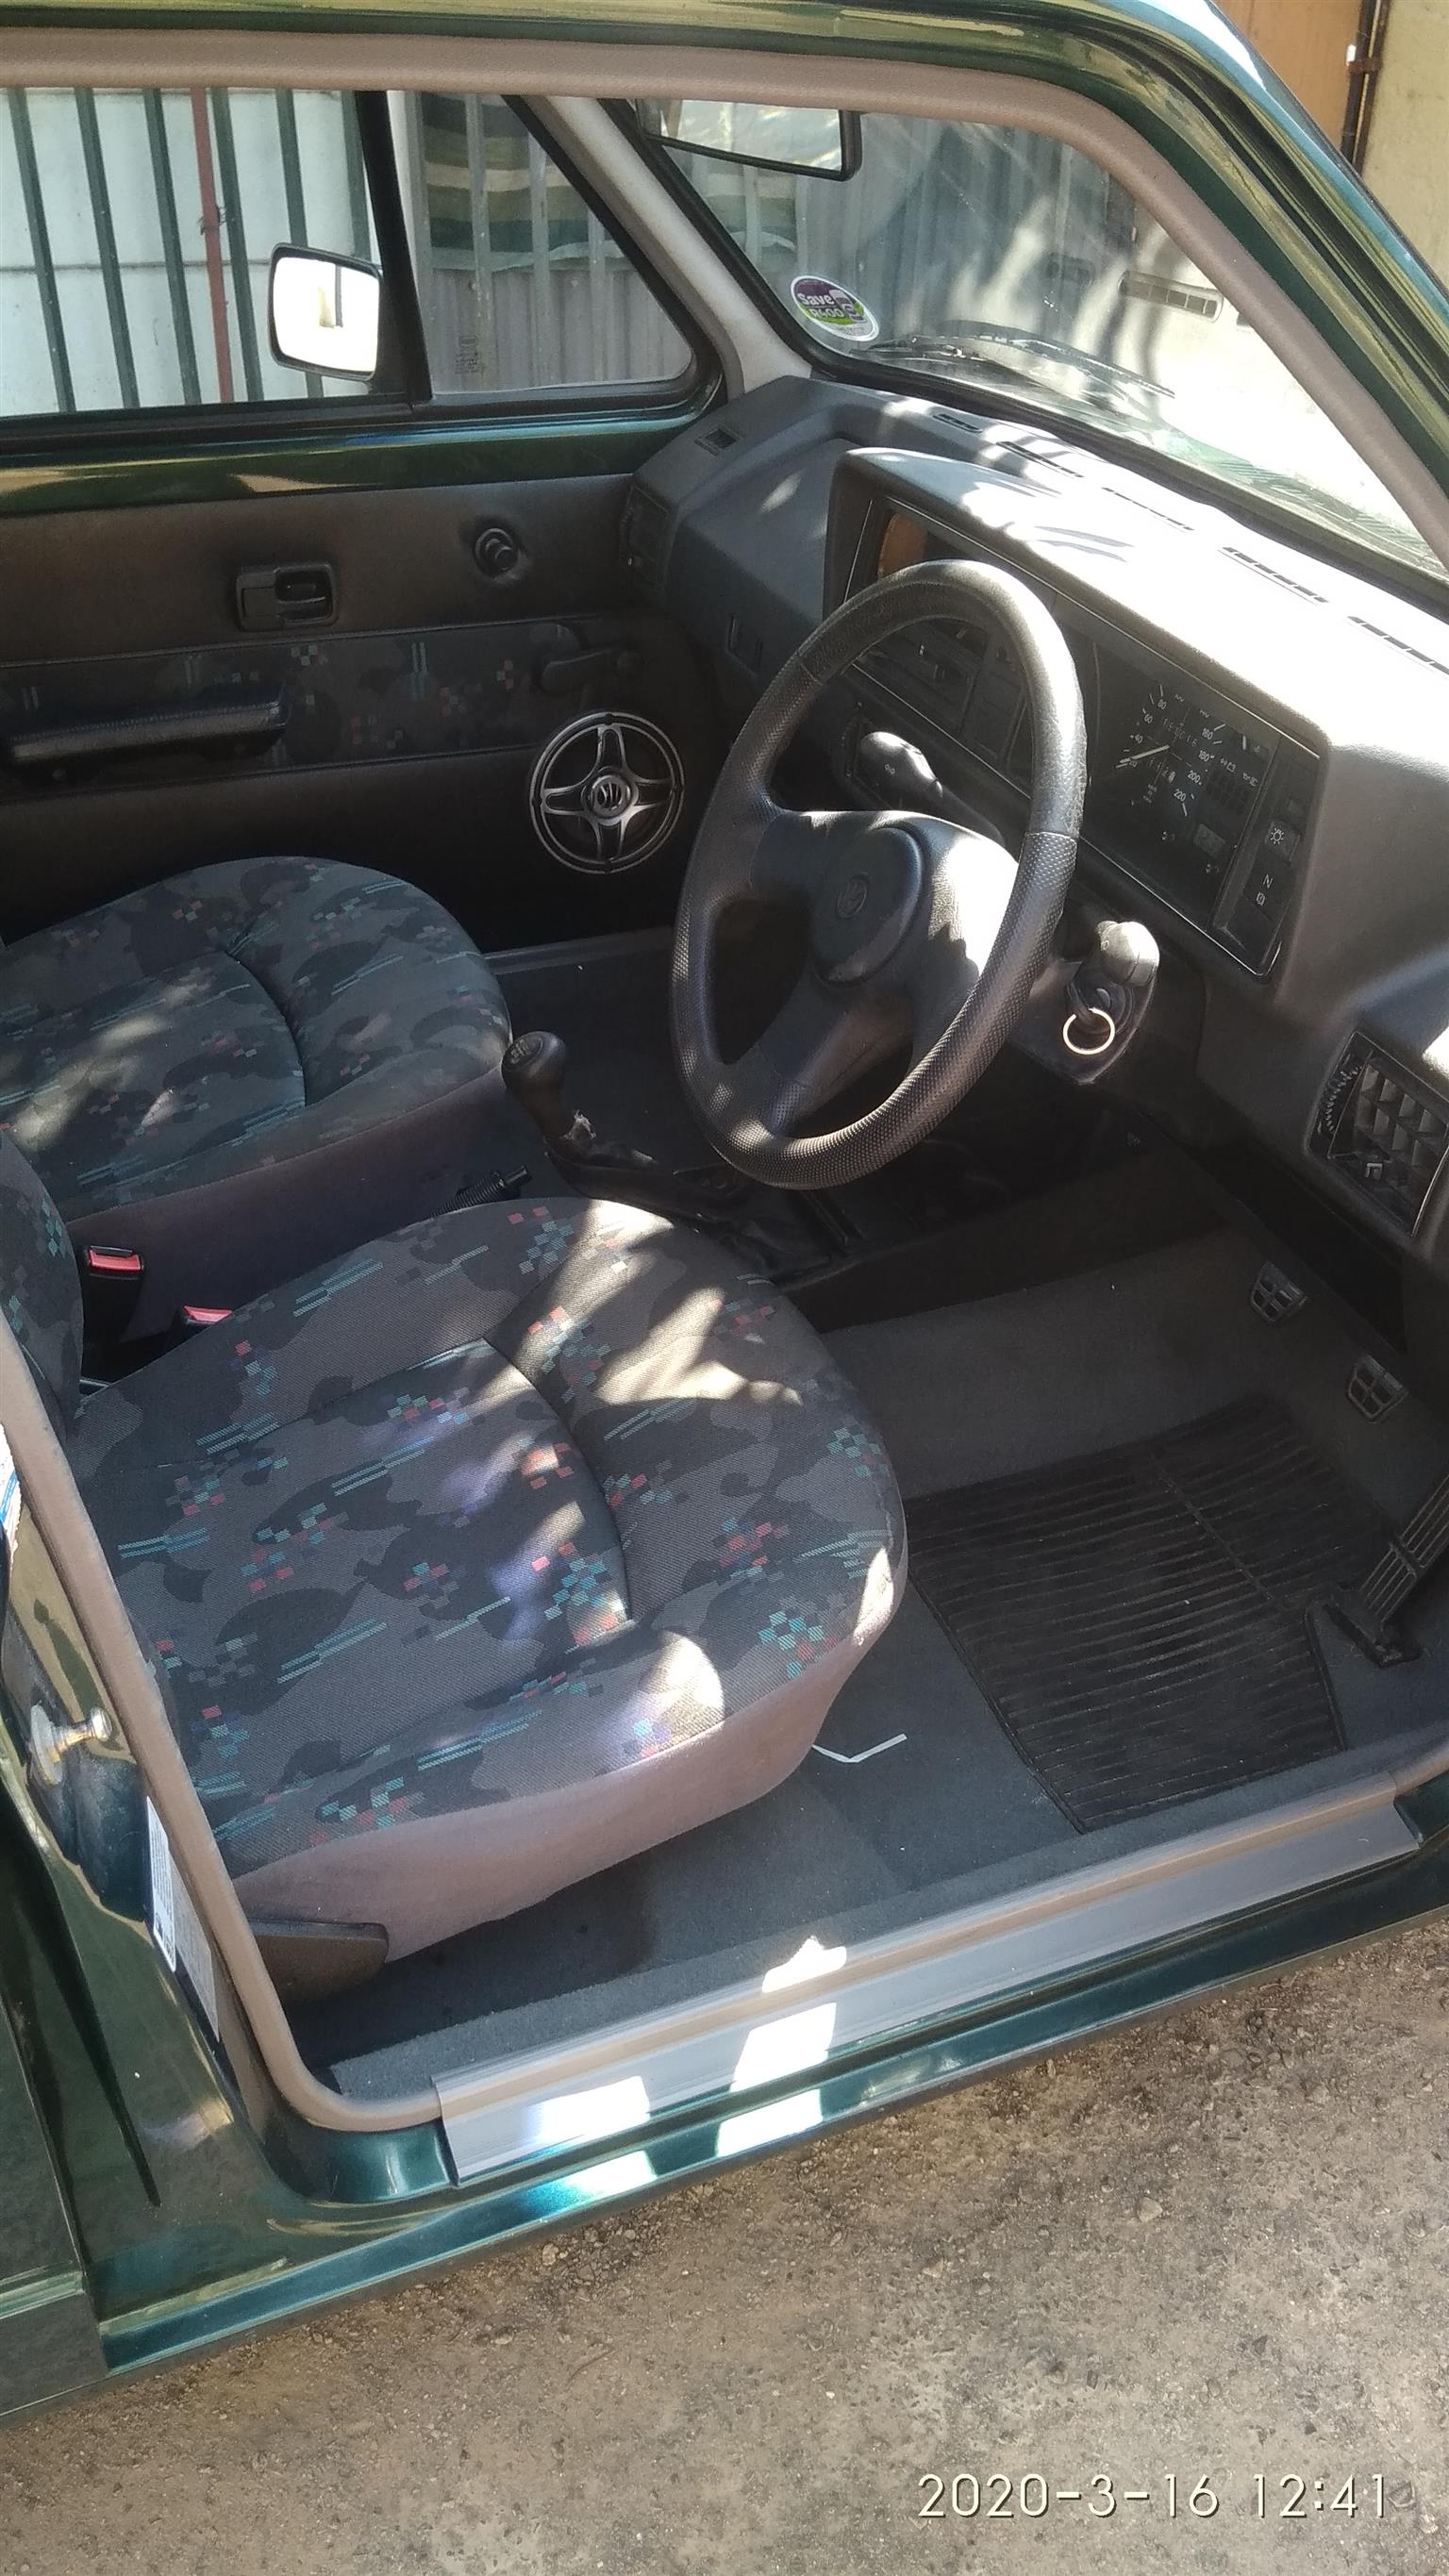 1999 VW Golf 1.6 Comfortline